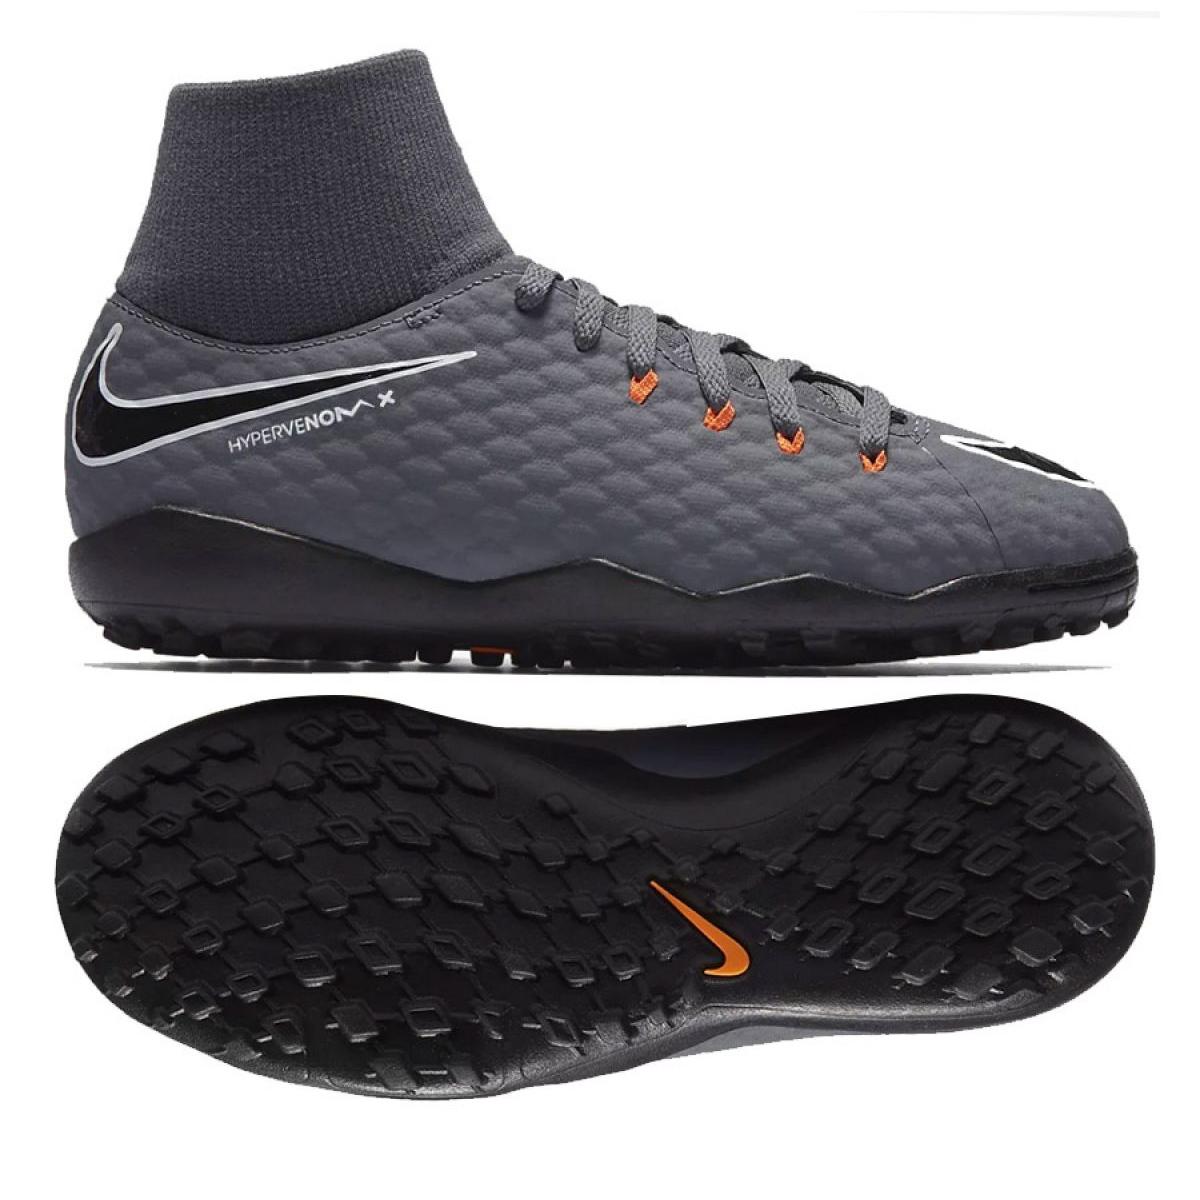 AH7293-081 Hypervenom 3 AH7293-081 Nike Df